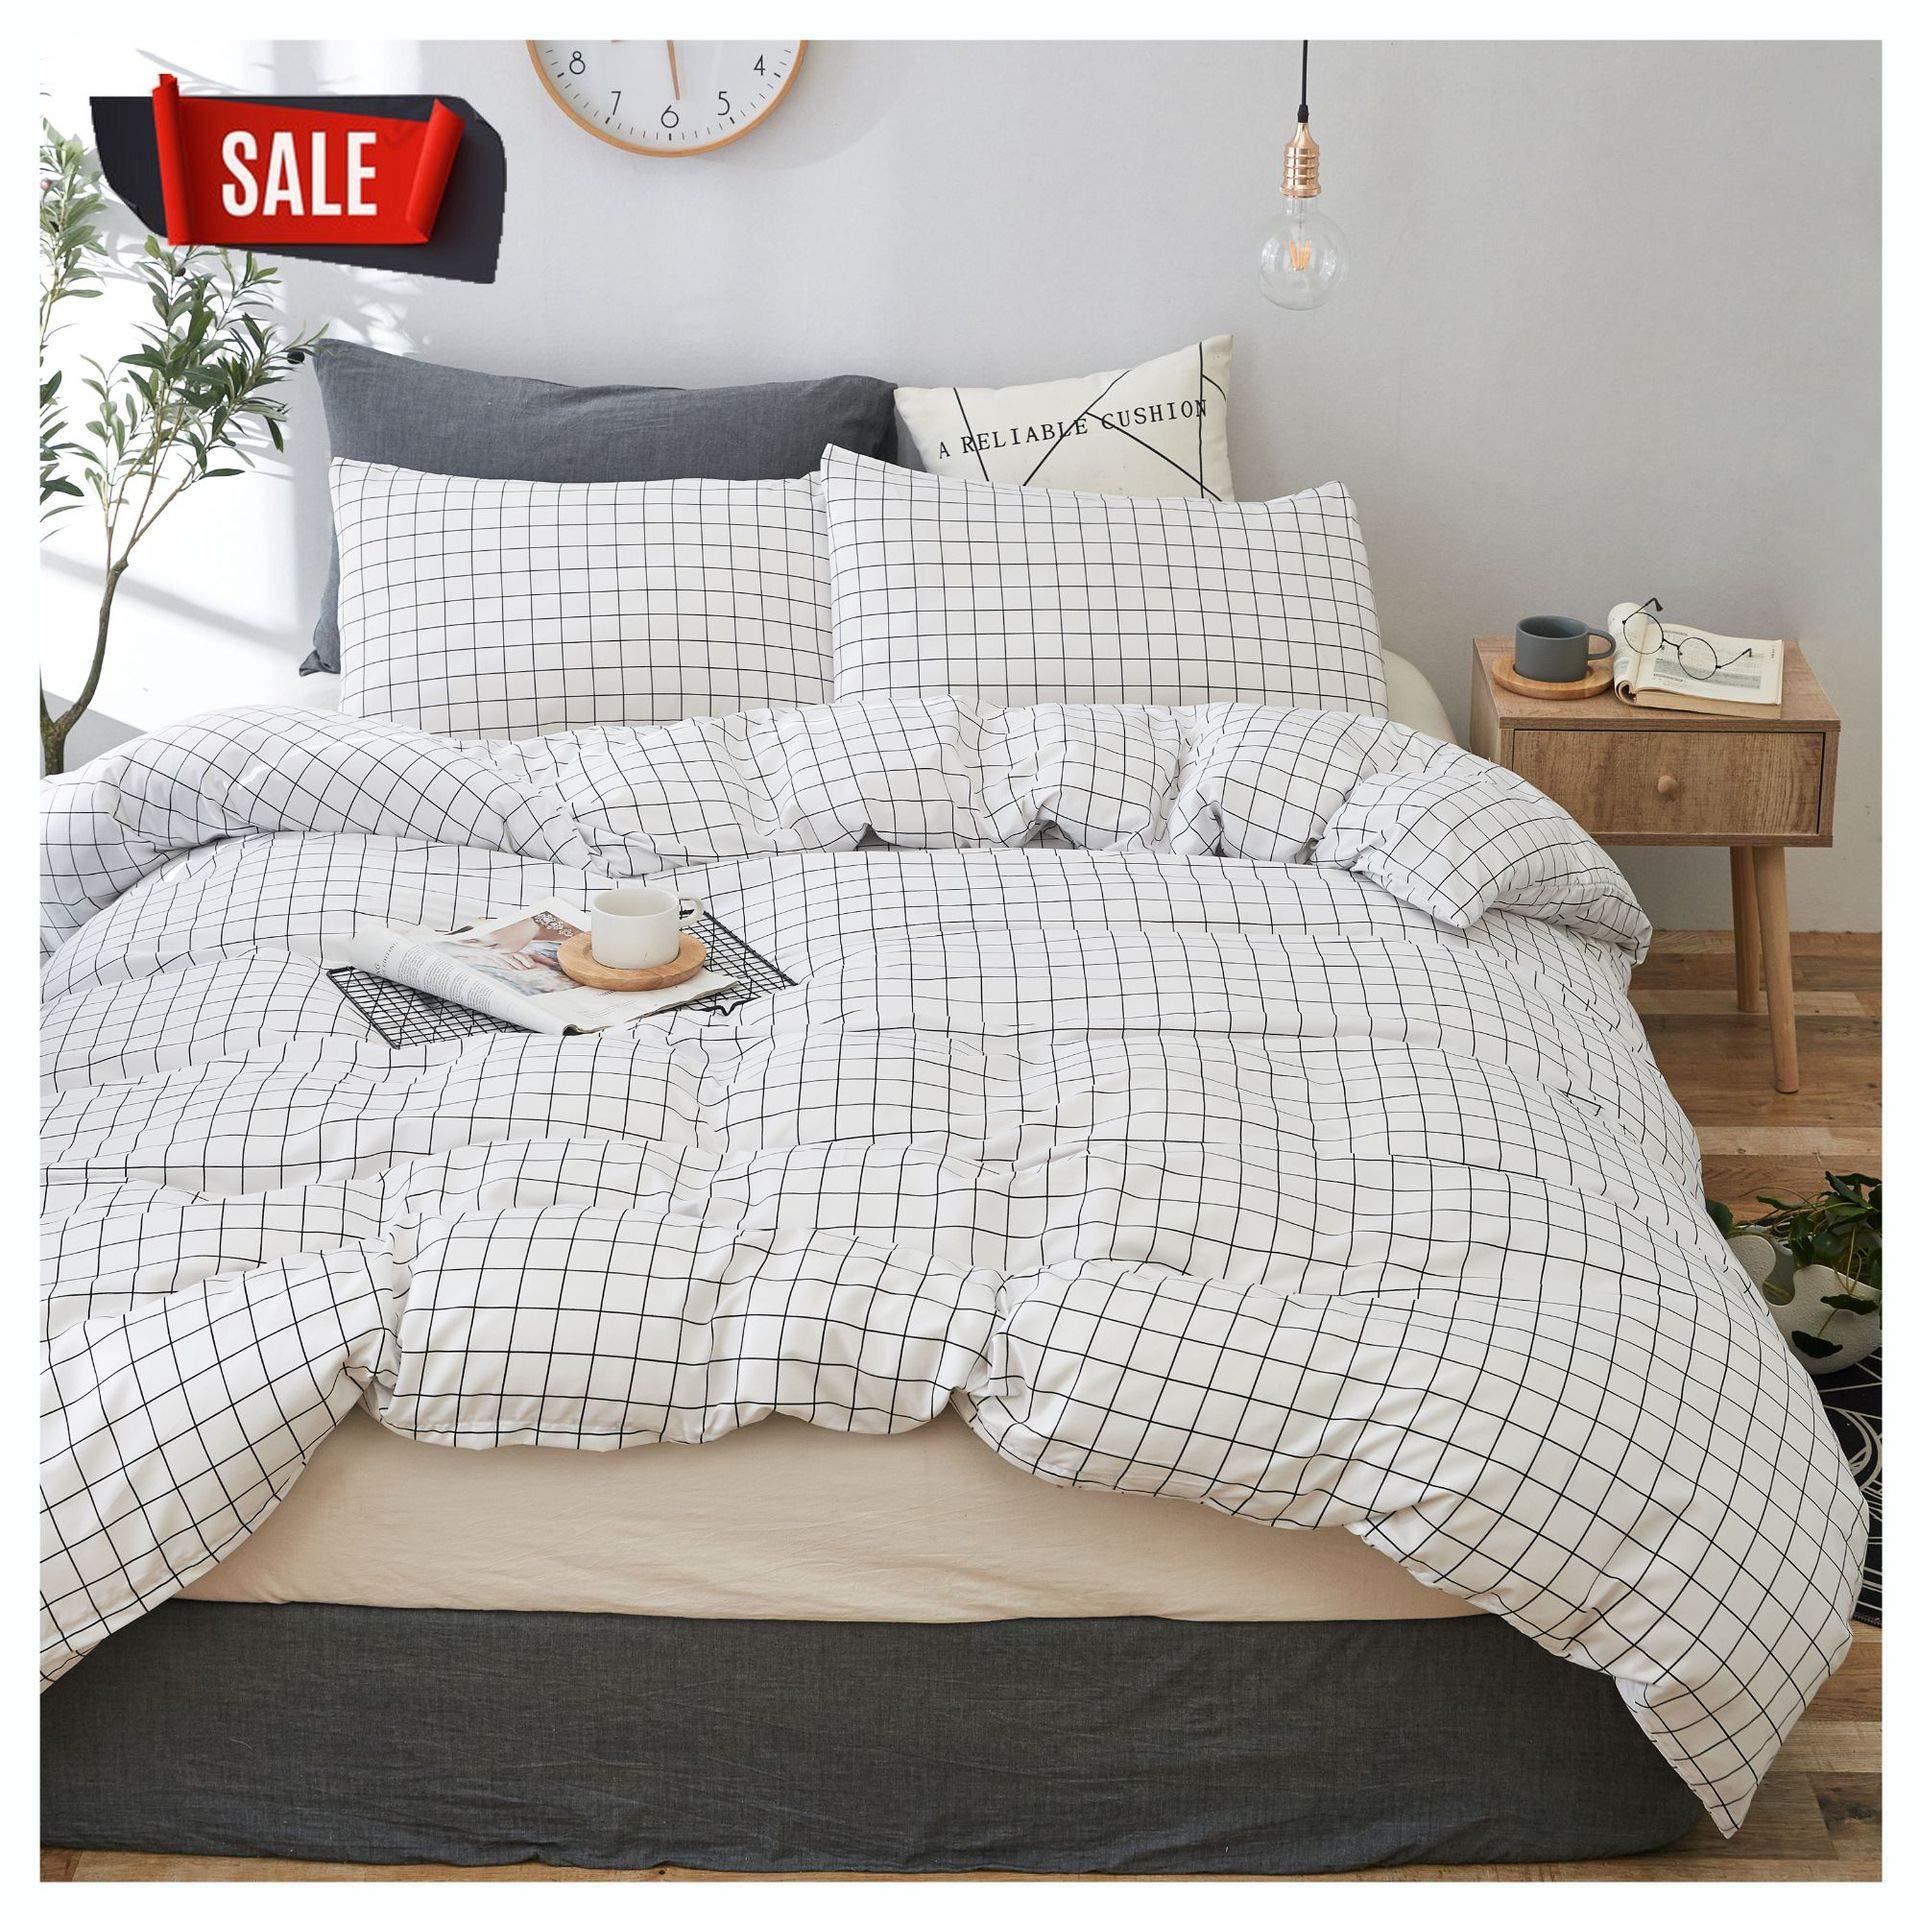 YZZ COLLECTION Kids Twin Bedding Duvet Cover Set,Premium Microfiber,Grid Pattern On Comforter Cover-3pcs:1x Duvet Cover 2X Pillowcases,Comforter Cover with Zipper Closure (Twin) by YZZ COLLECTION